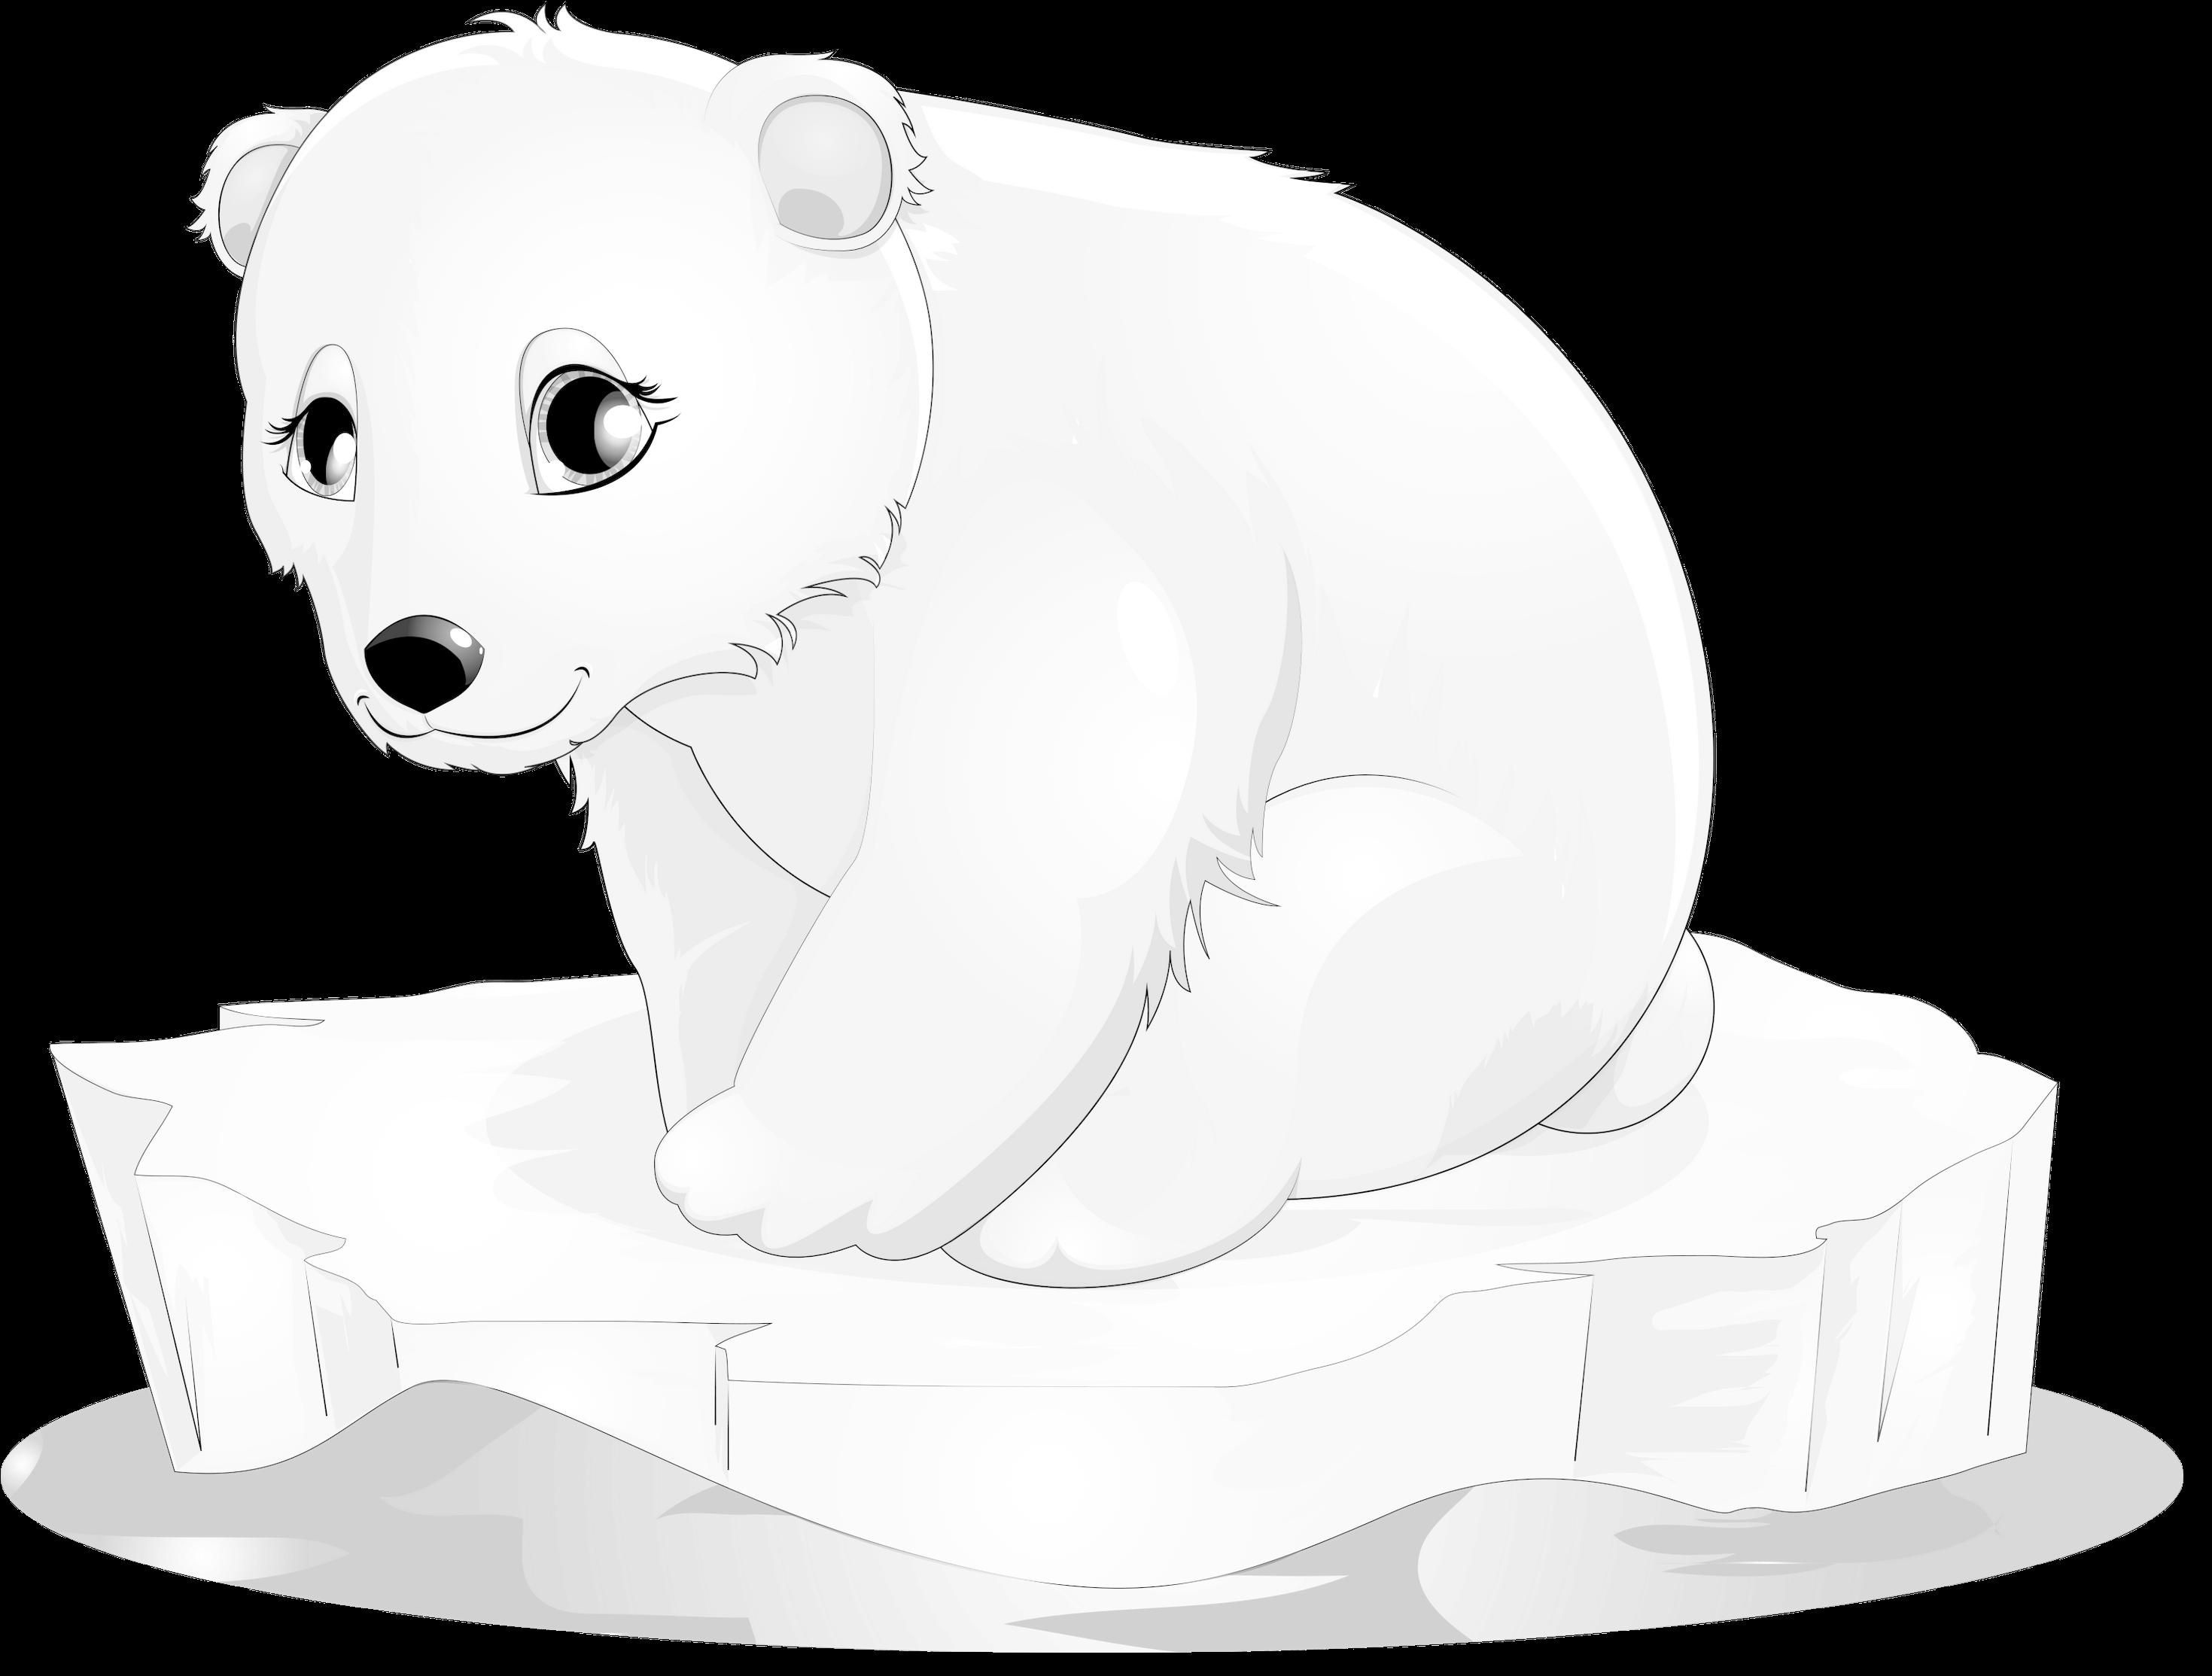 Polar Bear Clipart - Polar Bear Baby Clipart (2999x2329), Png Download